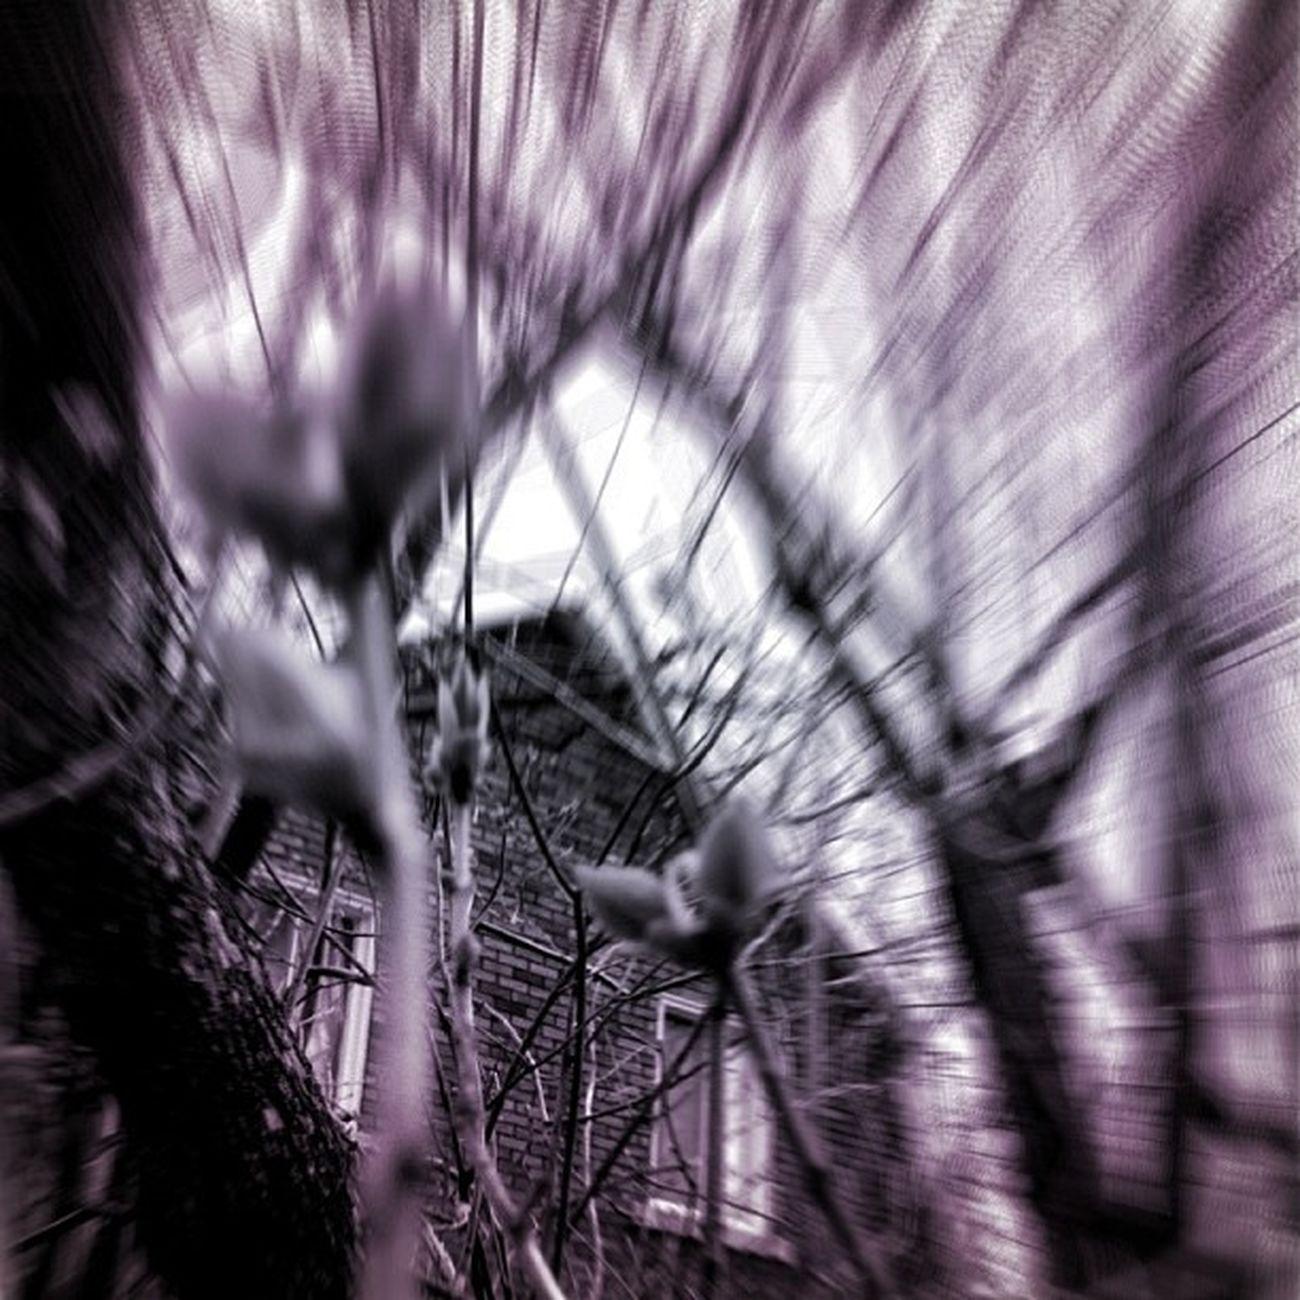 """All that we see or seem is but a dream within a dream."" ~Edgar Allan Poe #dream #dark #photo #blackandwhite #bnw #tone Blackandwhite Photo Dream Dark Bnw Tone Igdungeon Contestgram Ig_4every1_spooky Pf_arts"